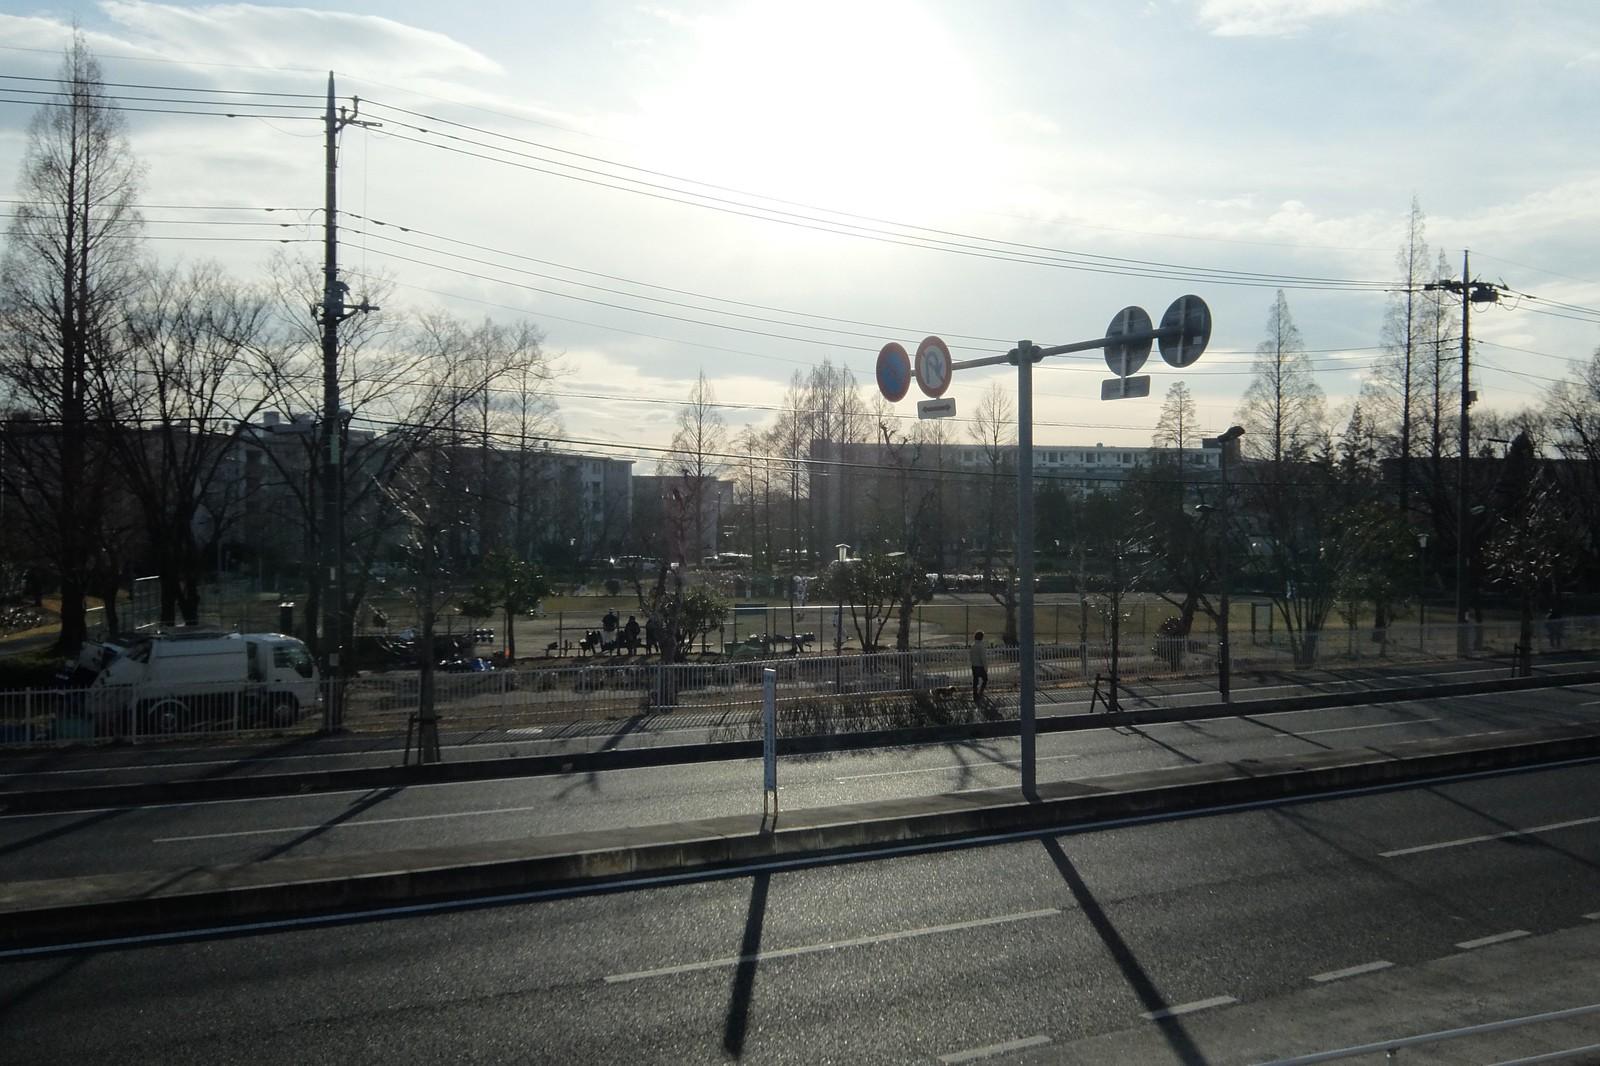 Saitama Shinmisato in Japan